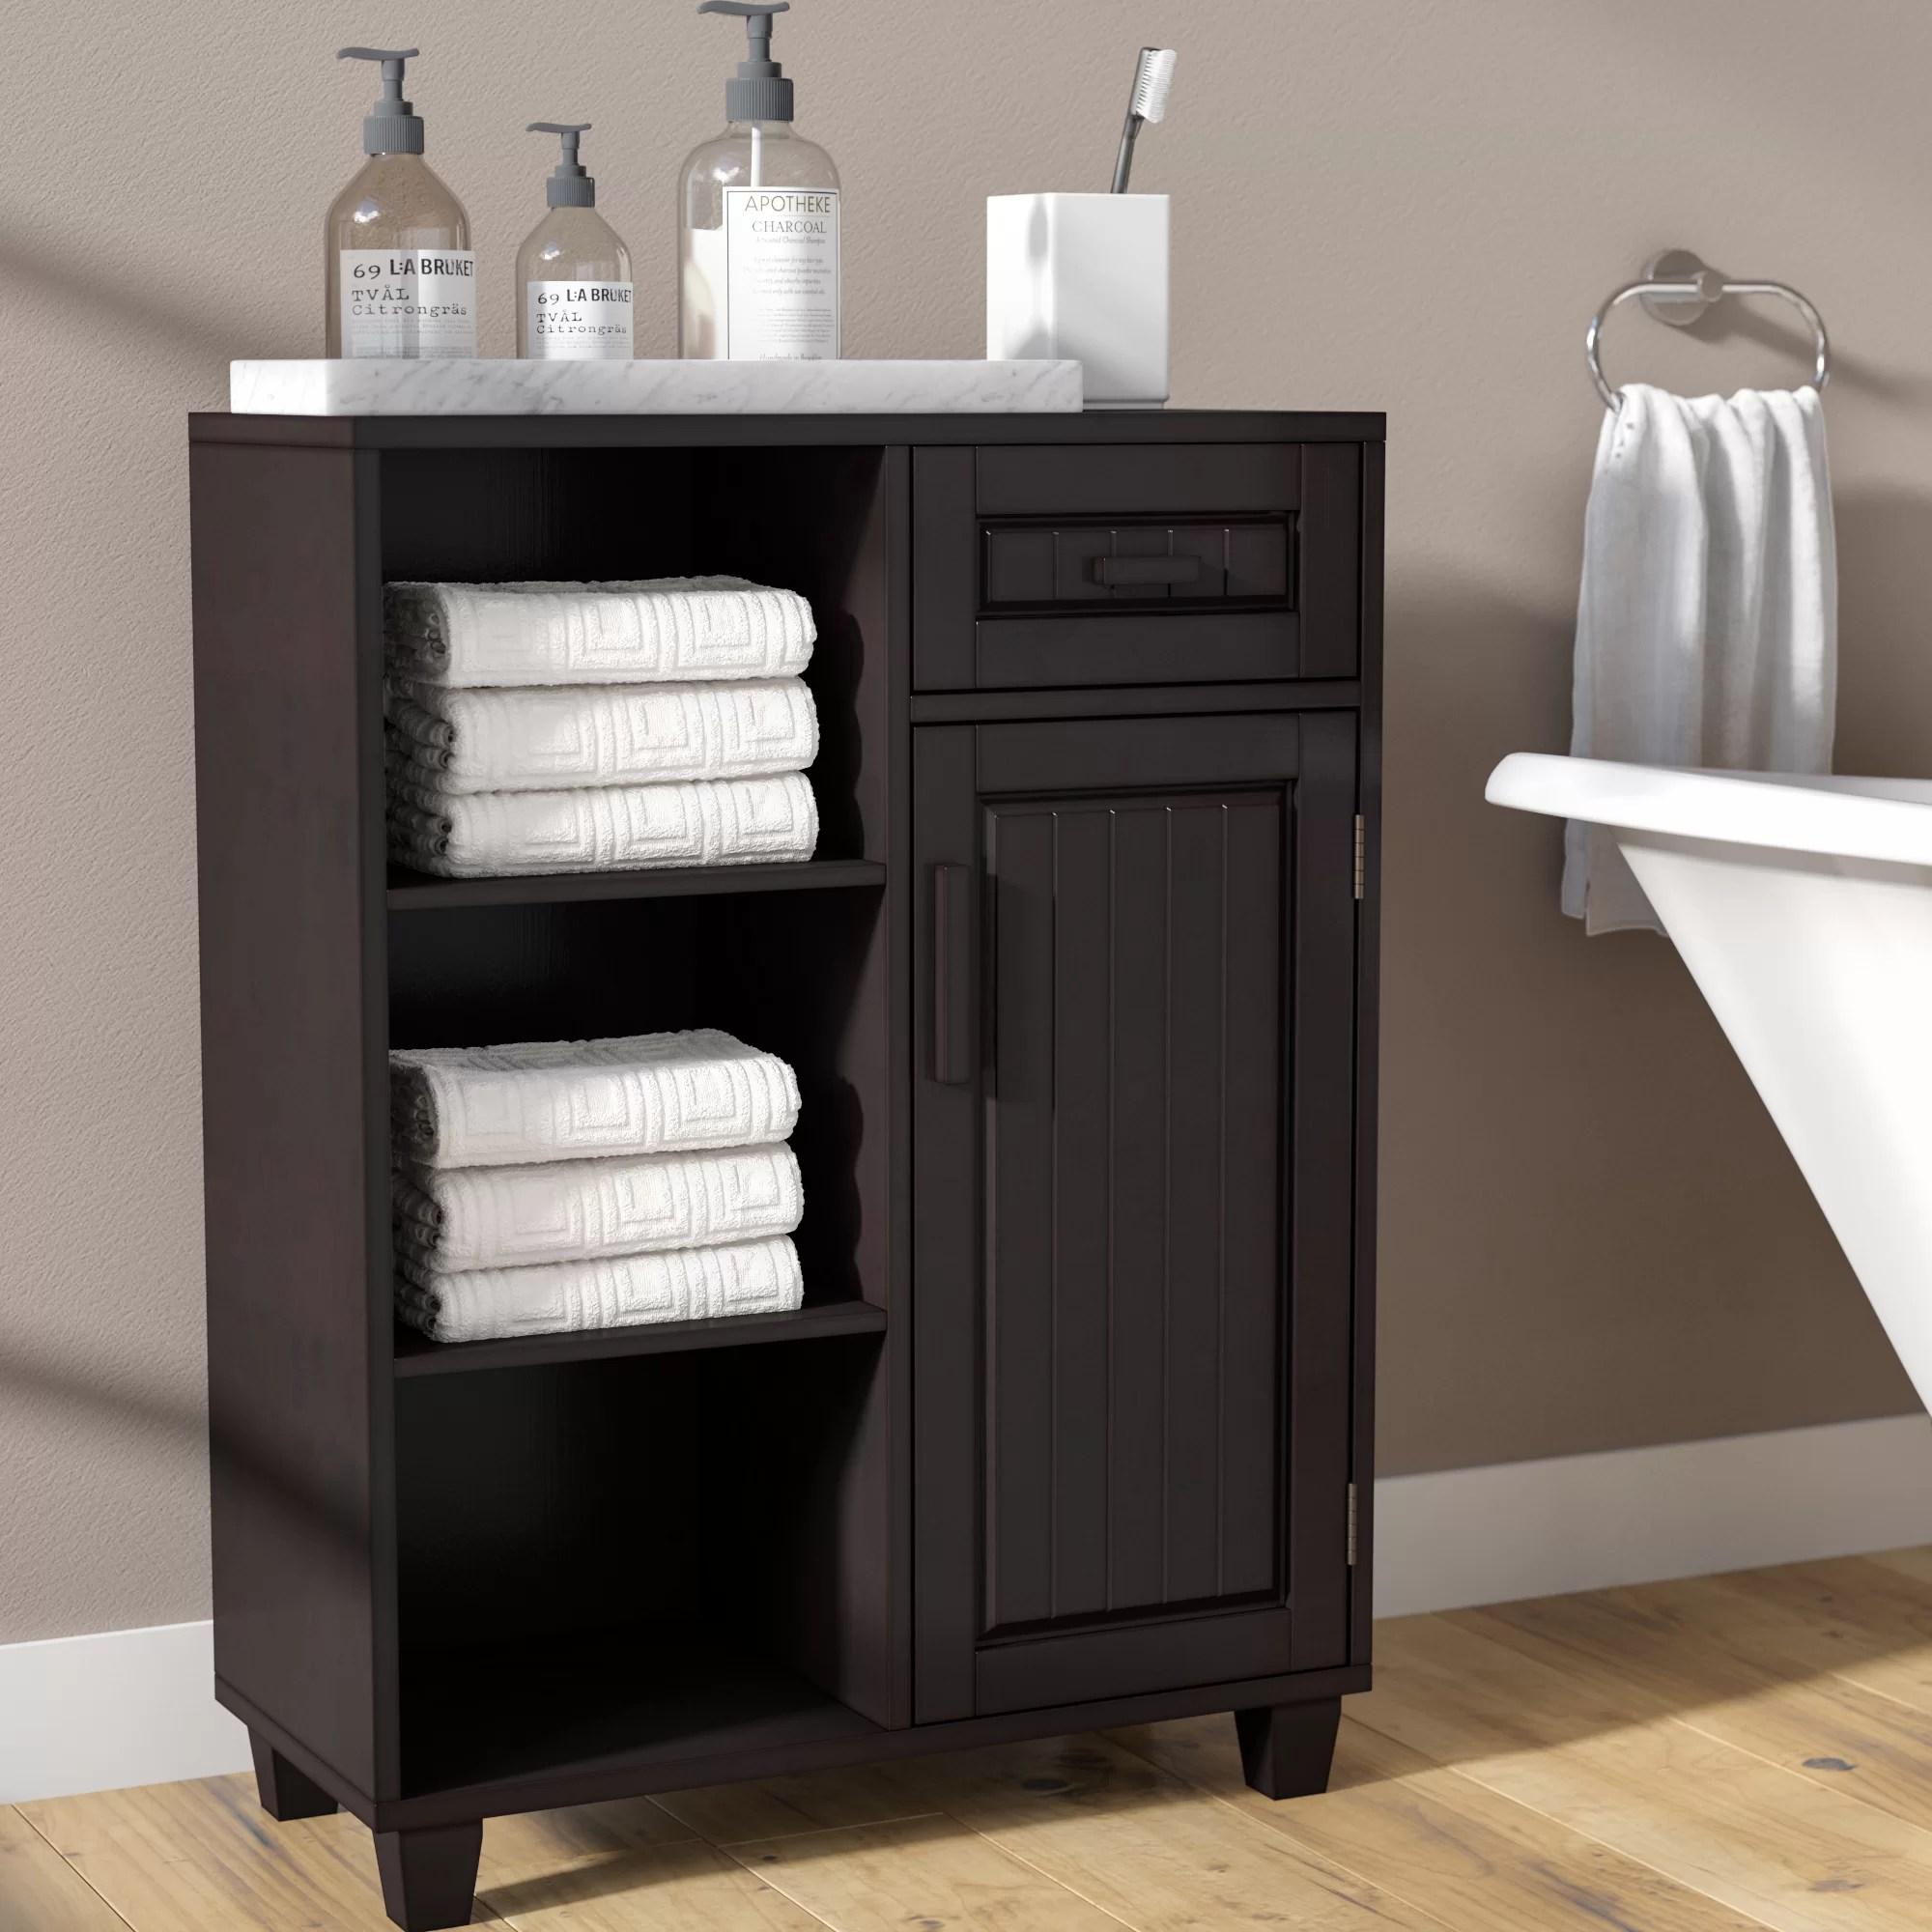 Espresso Wood Bathroom Cabinets Shelving You Ll Love In 2020 Wayfair